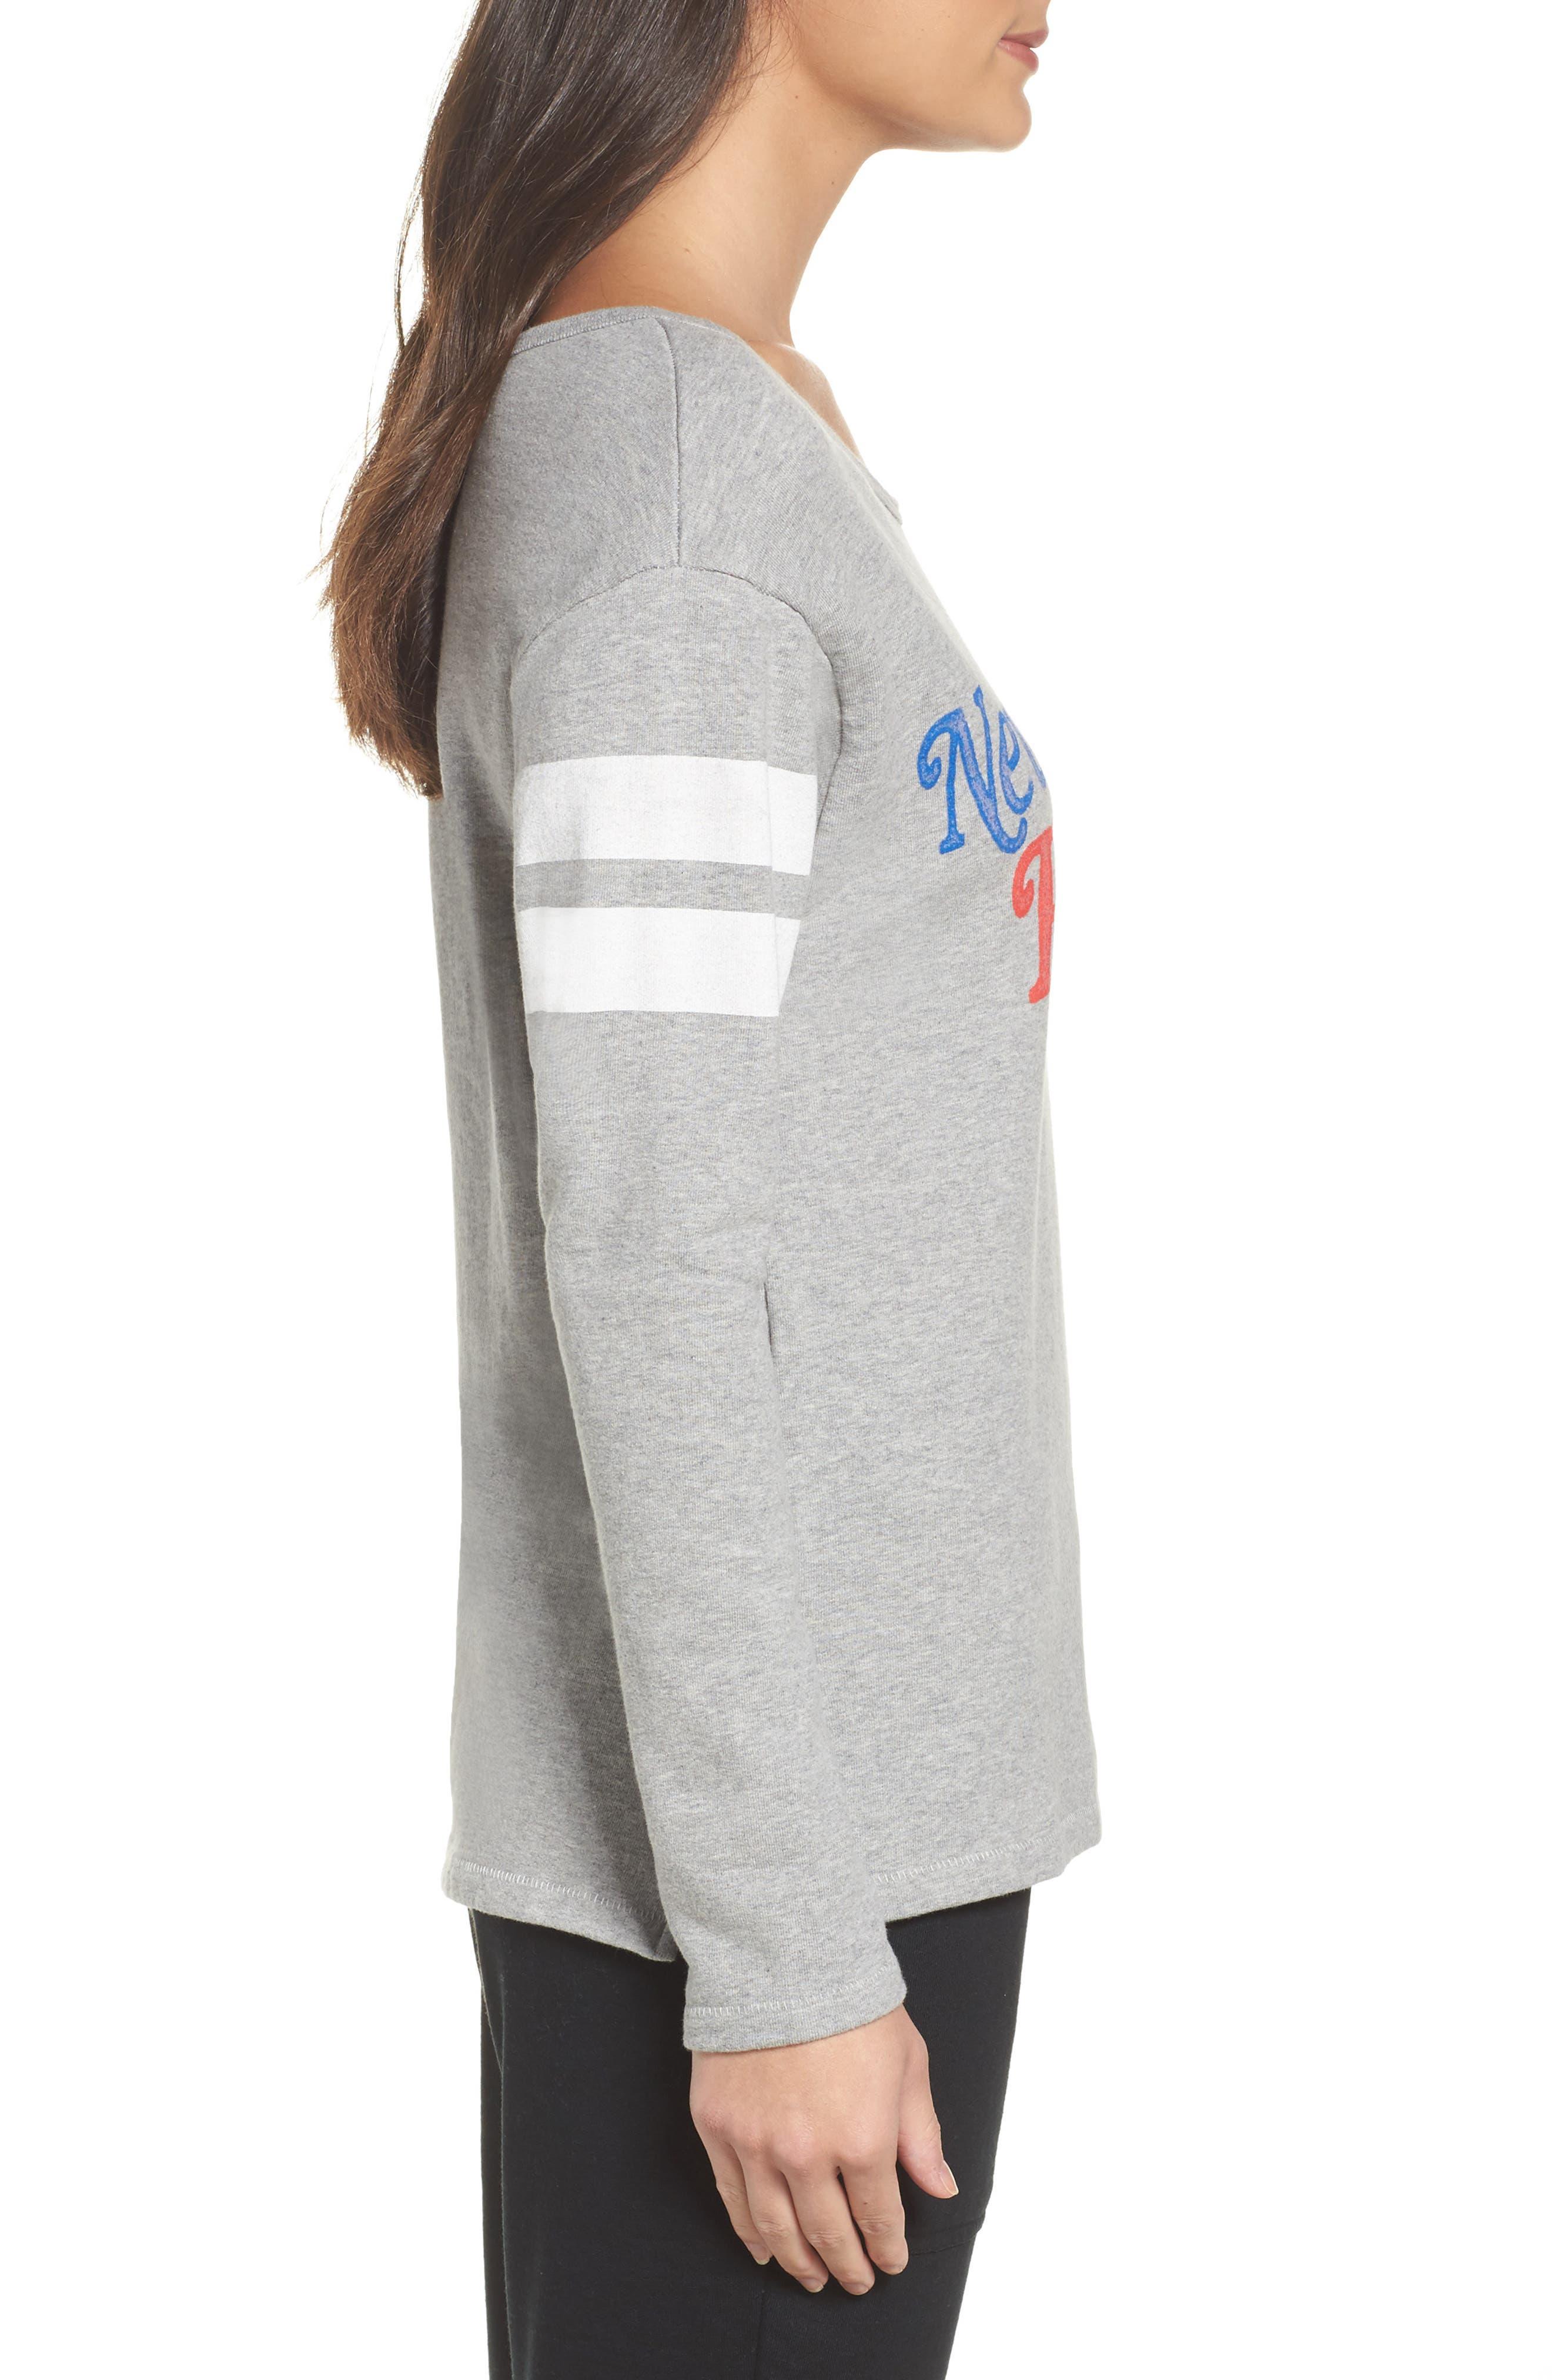 NFL New England Patriots Champion Sweatshirt,                             Alternate thumbnail 3, color,                             Heather Grey